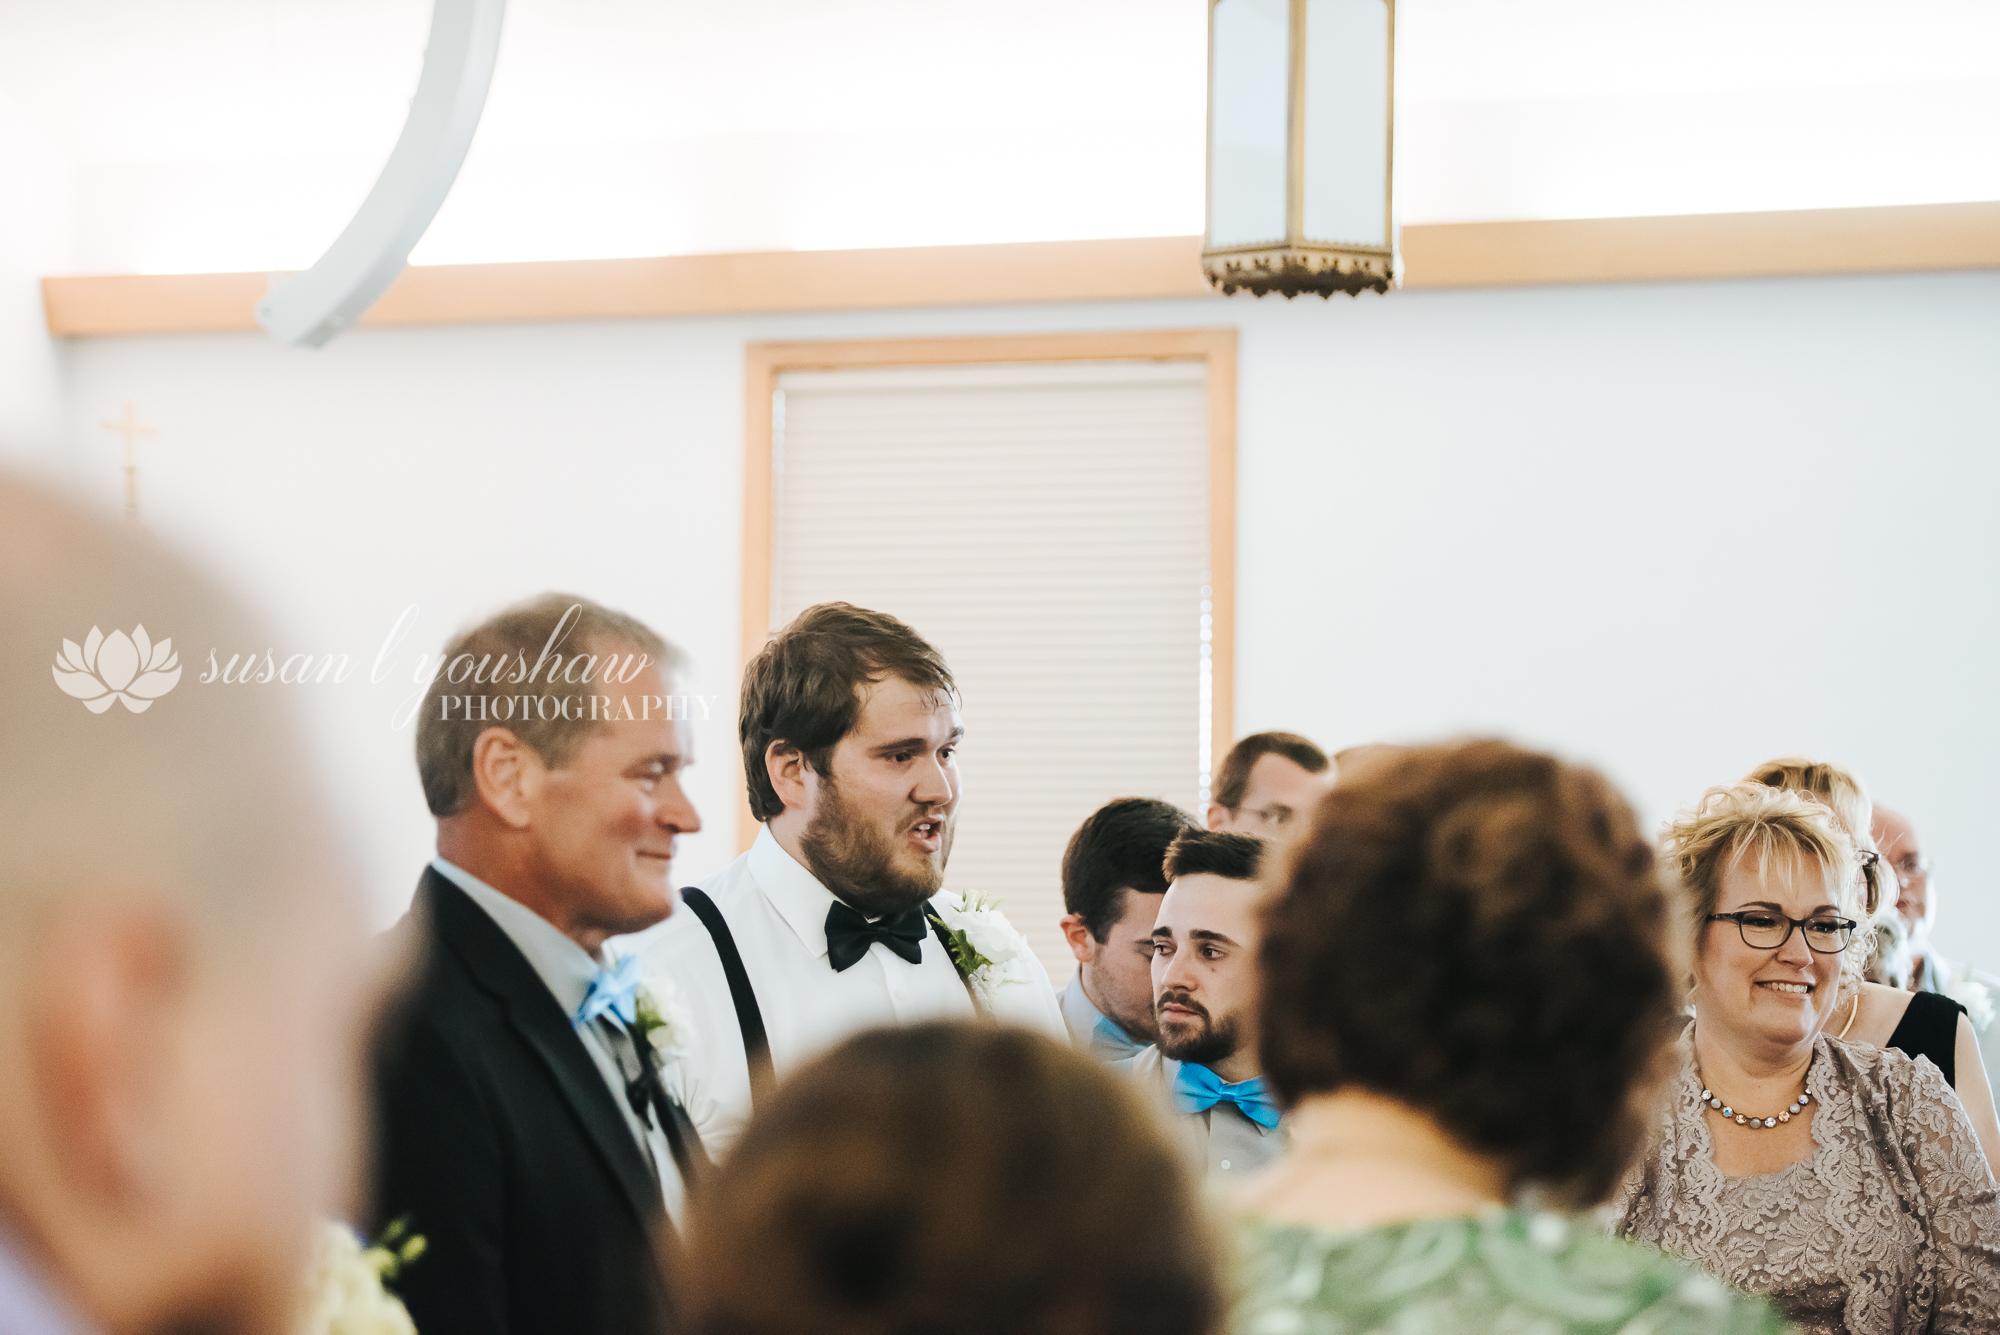 Katelyn and Wes Wedding Photos 07-13-2019 SLY Photography-56.jpg